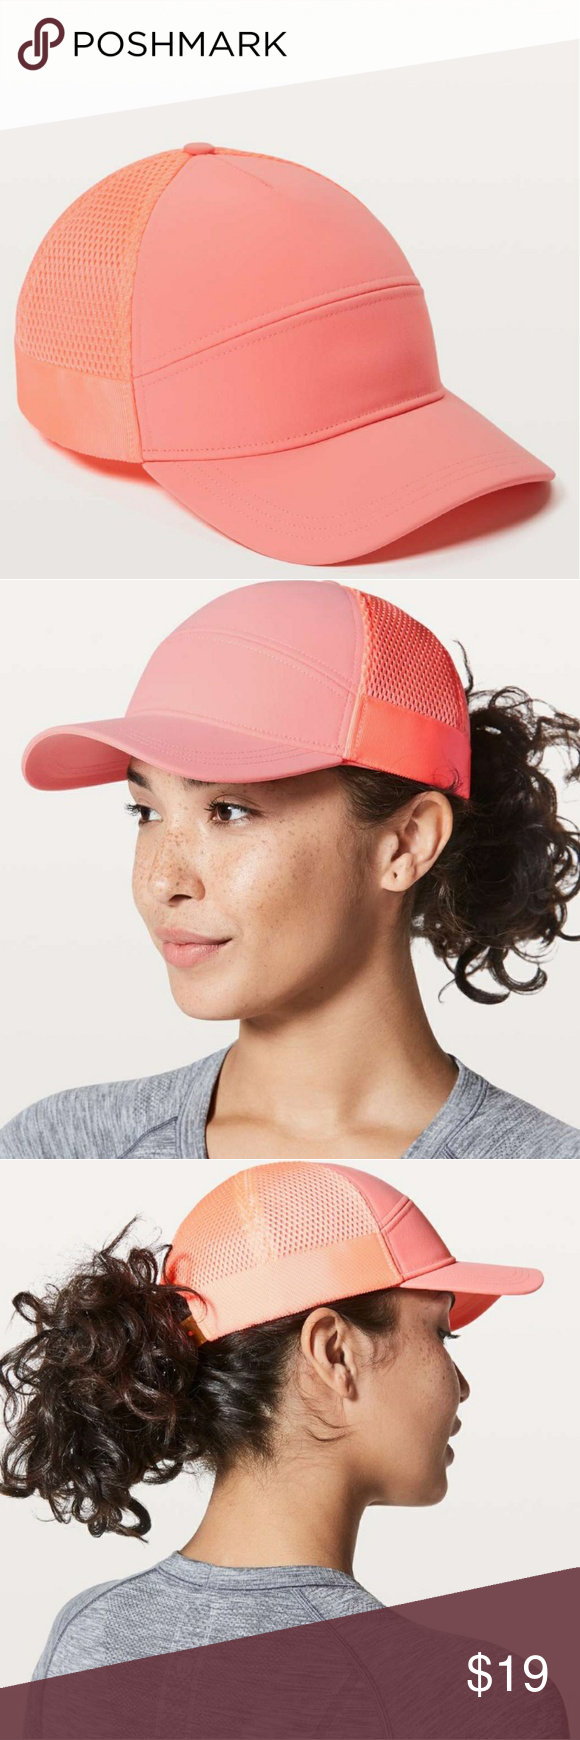 635d8c47 Lululemon Dash & Splash Cap II Lululemon Dash & Splash Cap II Brand New  with tags lululemon athletica Accessories Hats